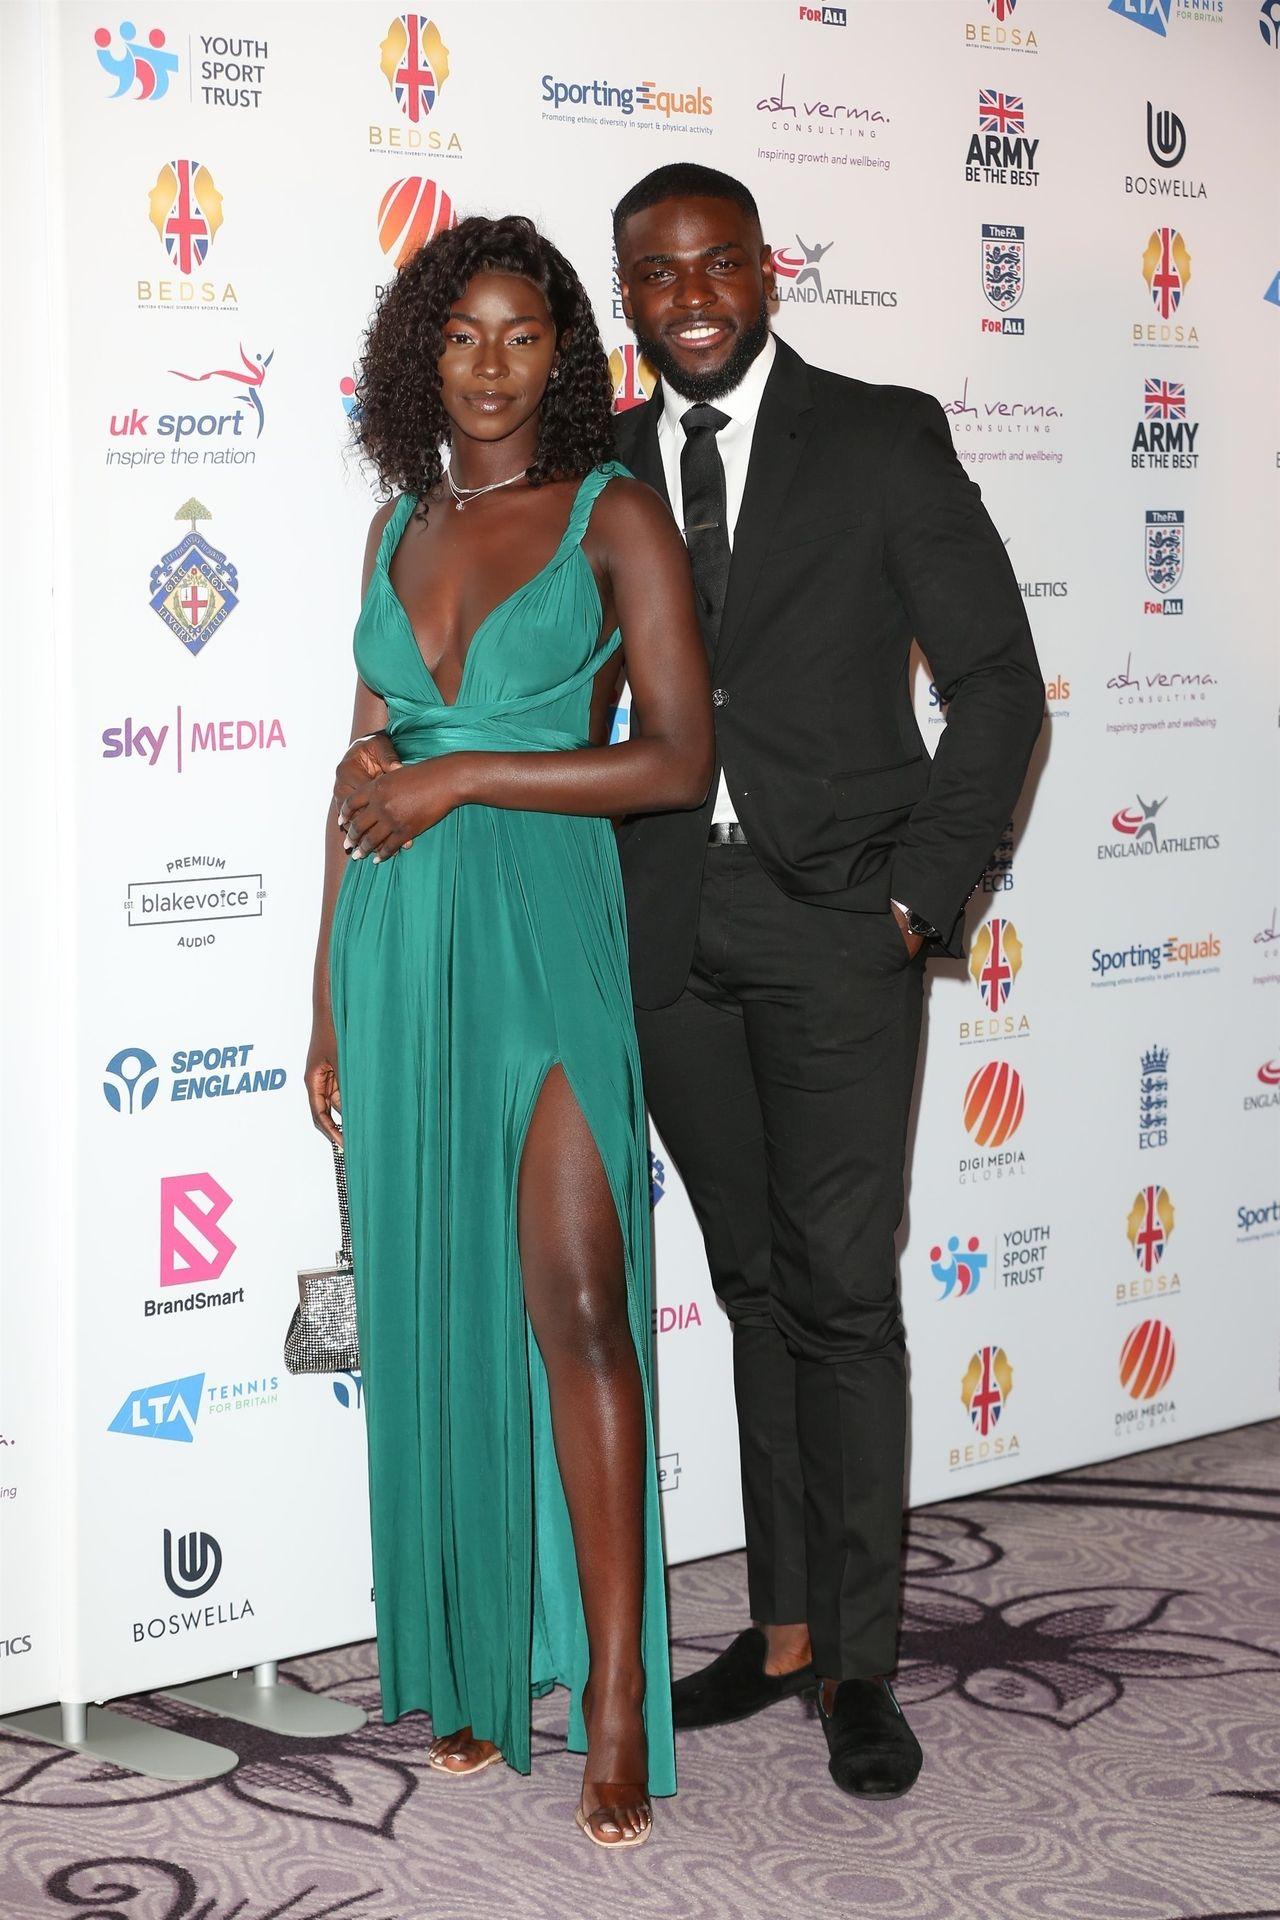 Mike Boateng & Priscilla Anyabu Are Seen At British Ethnic Diversity Sports Awards 0035